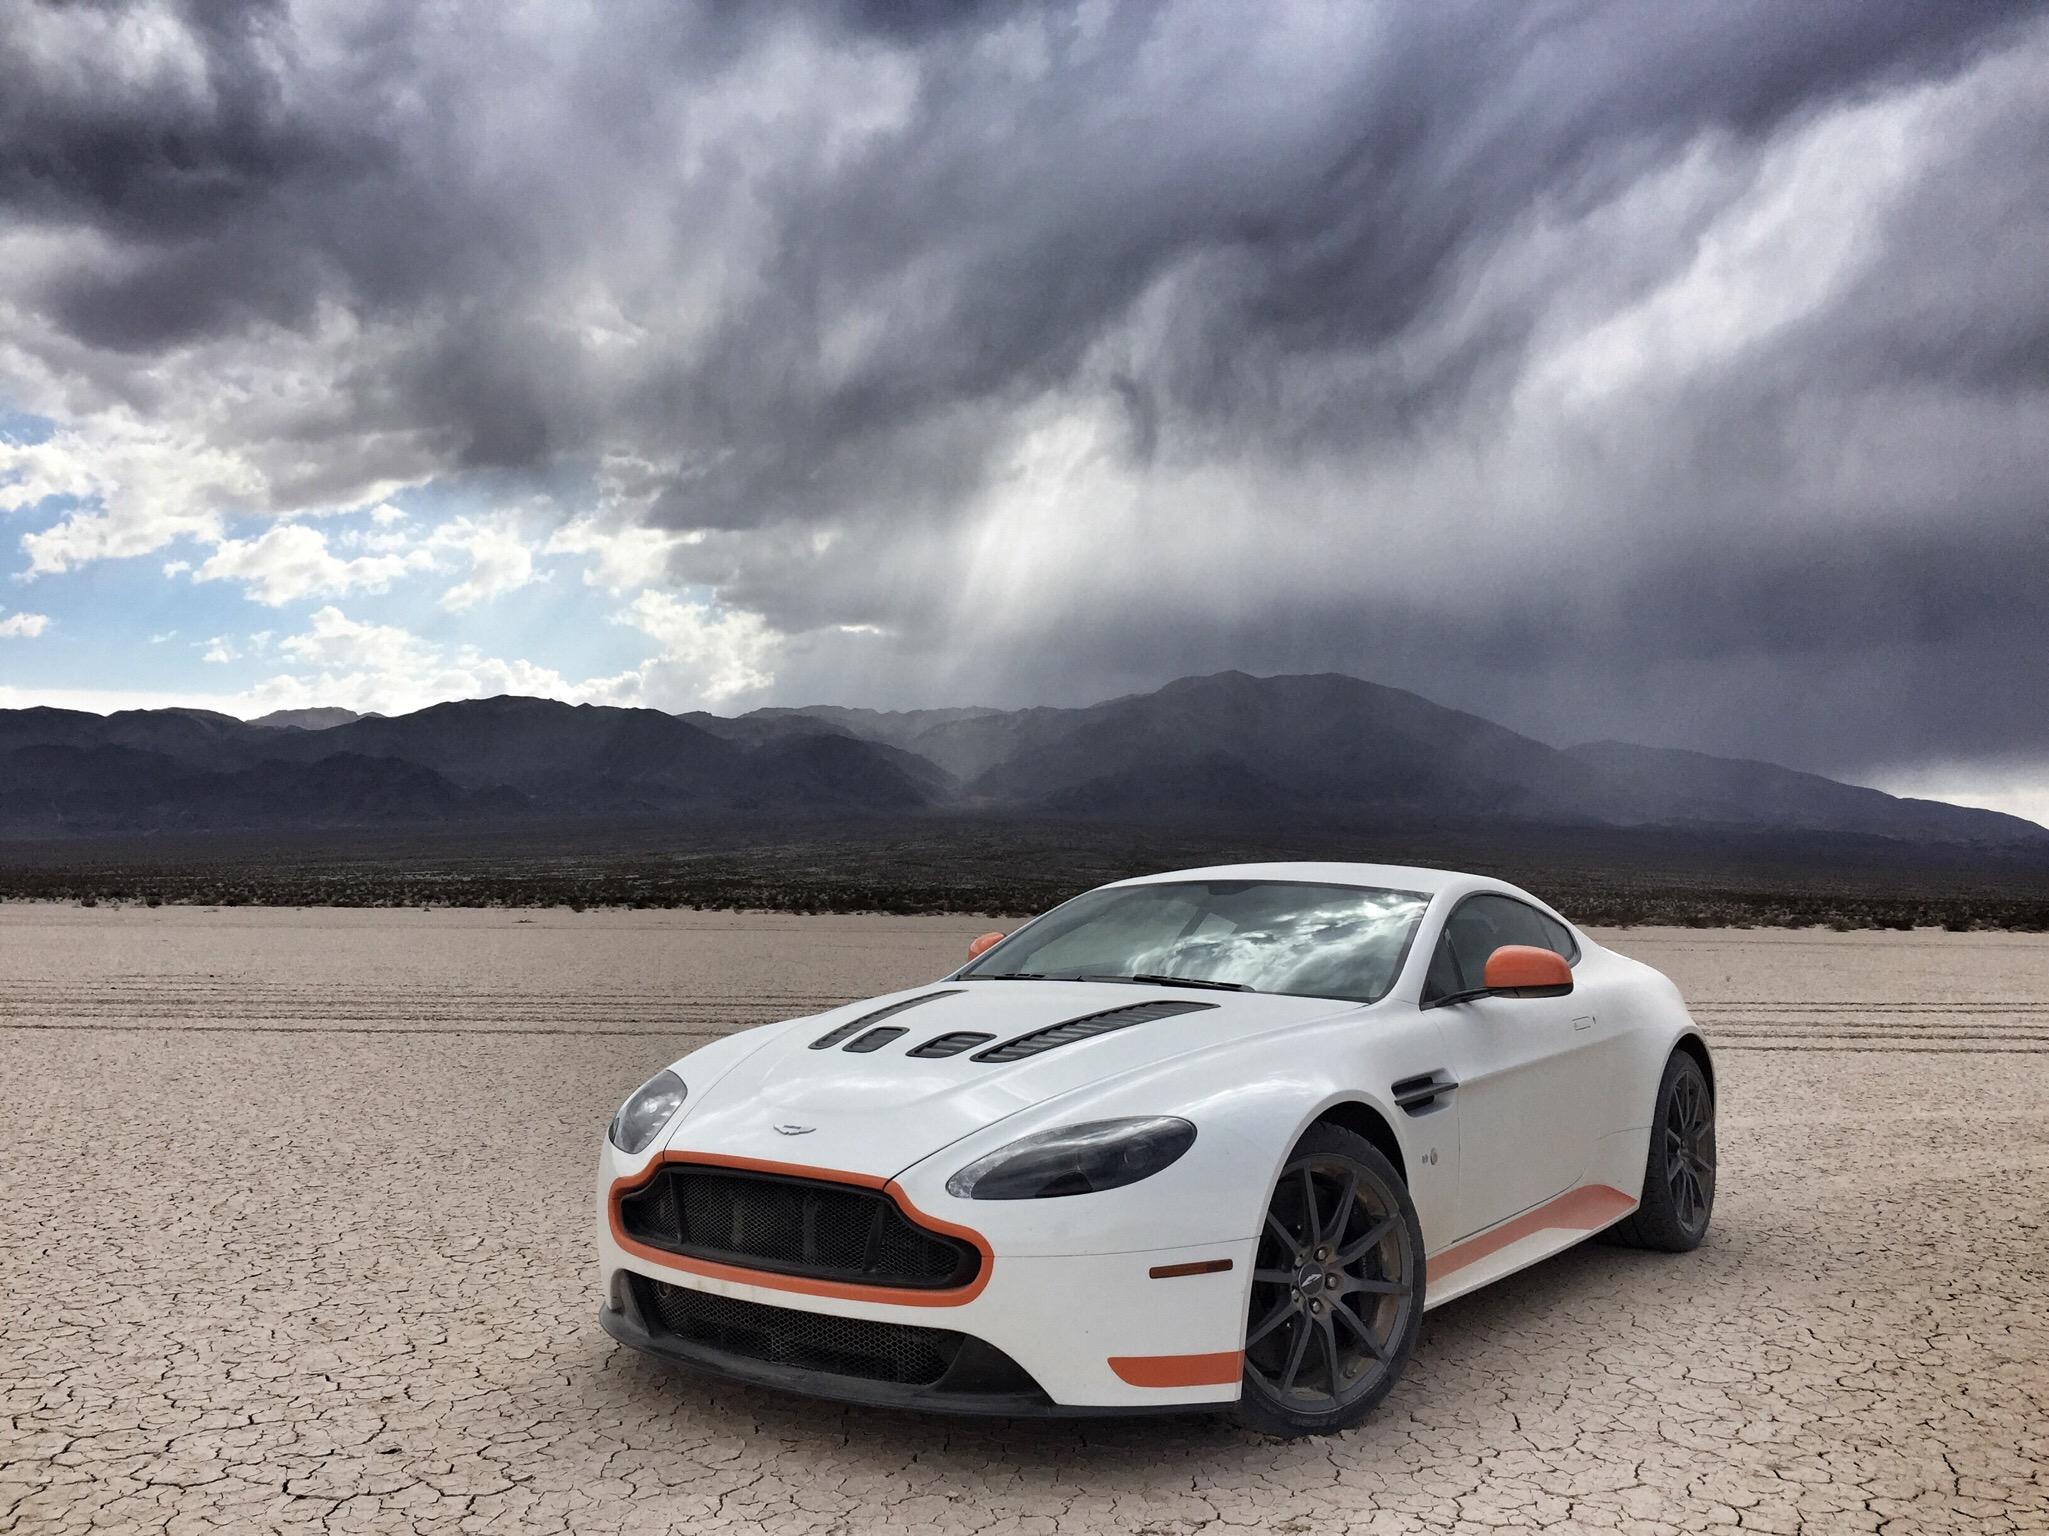 Aston Martin Vantage S Backgrounds on Wallpapers Vista